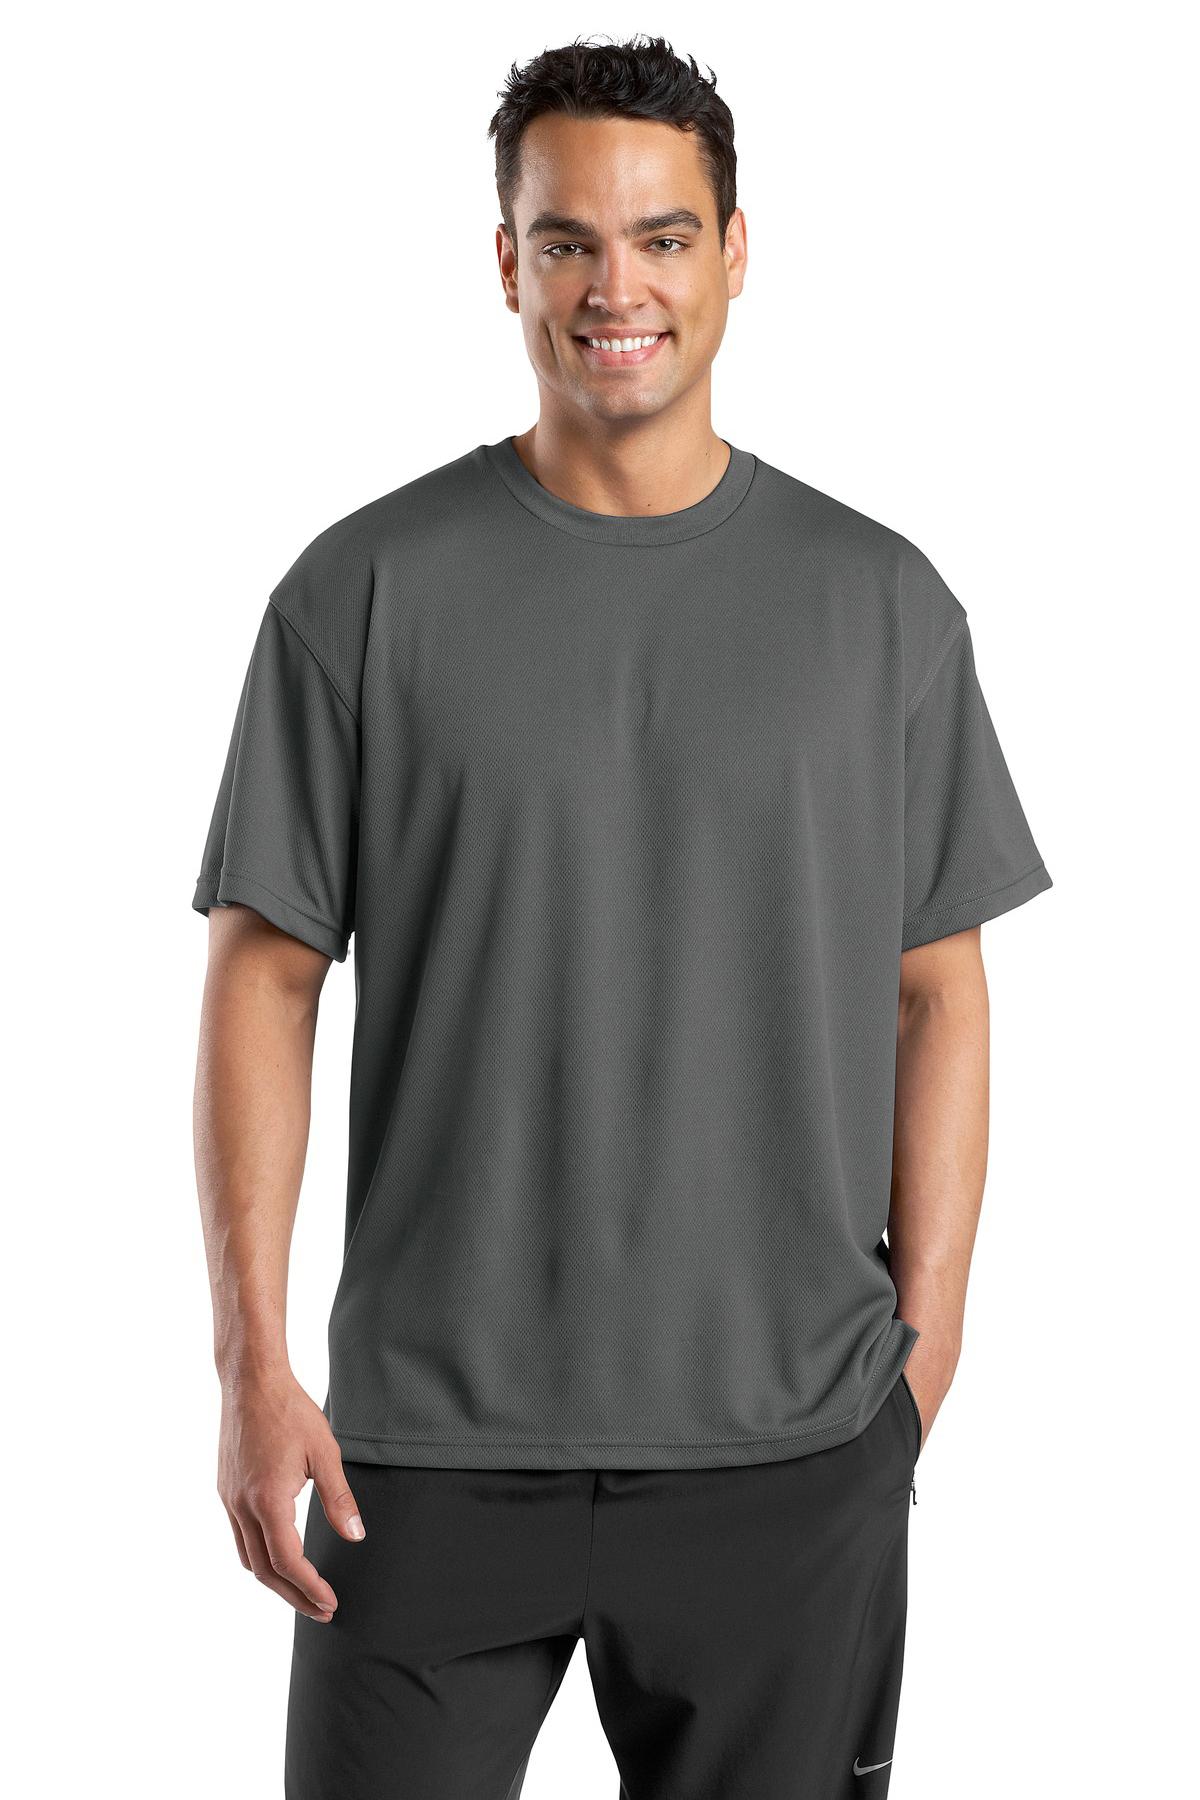 T-Shirts-Performance-8